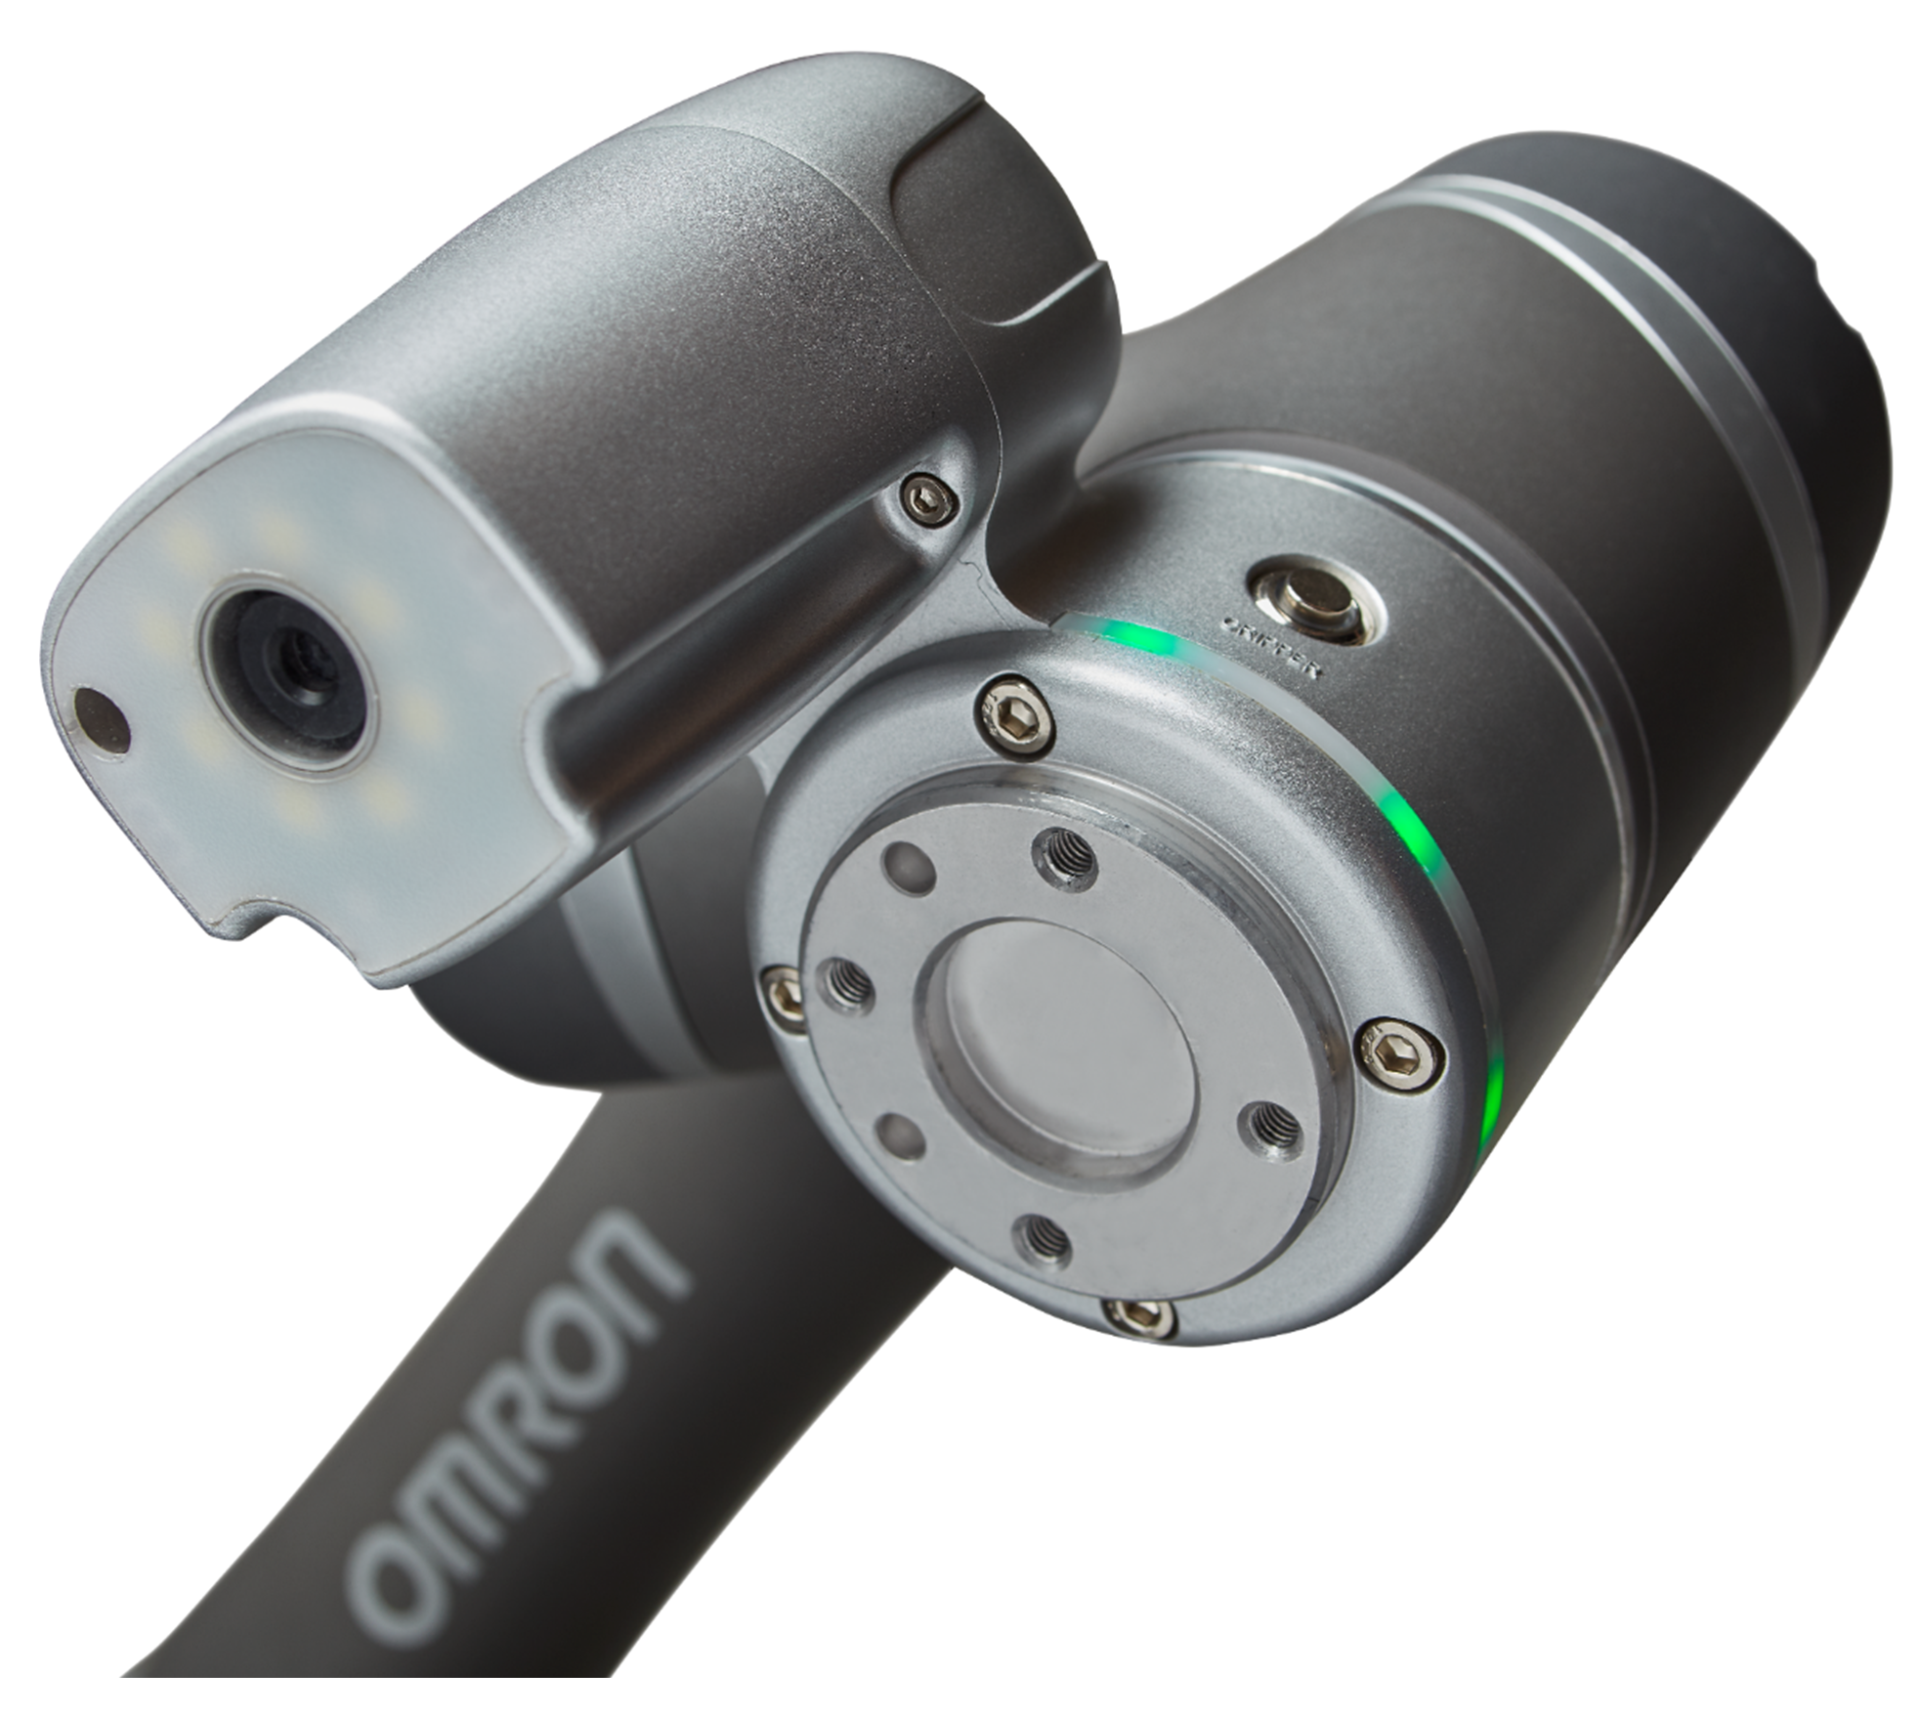 Omron_Techman_EndofArm_Vision